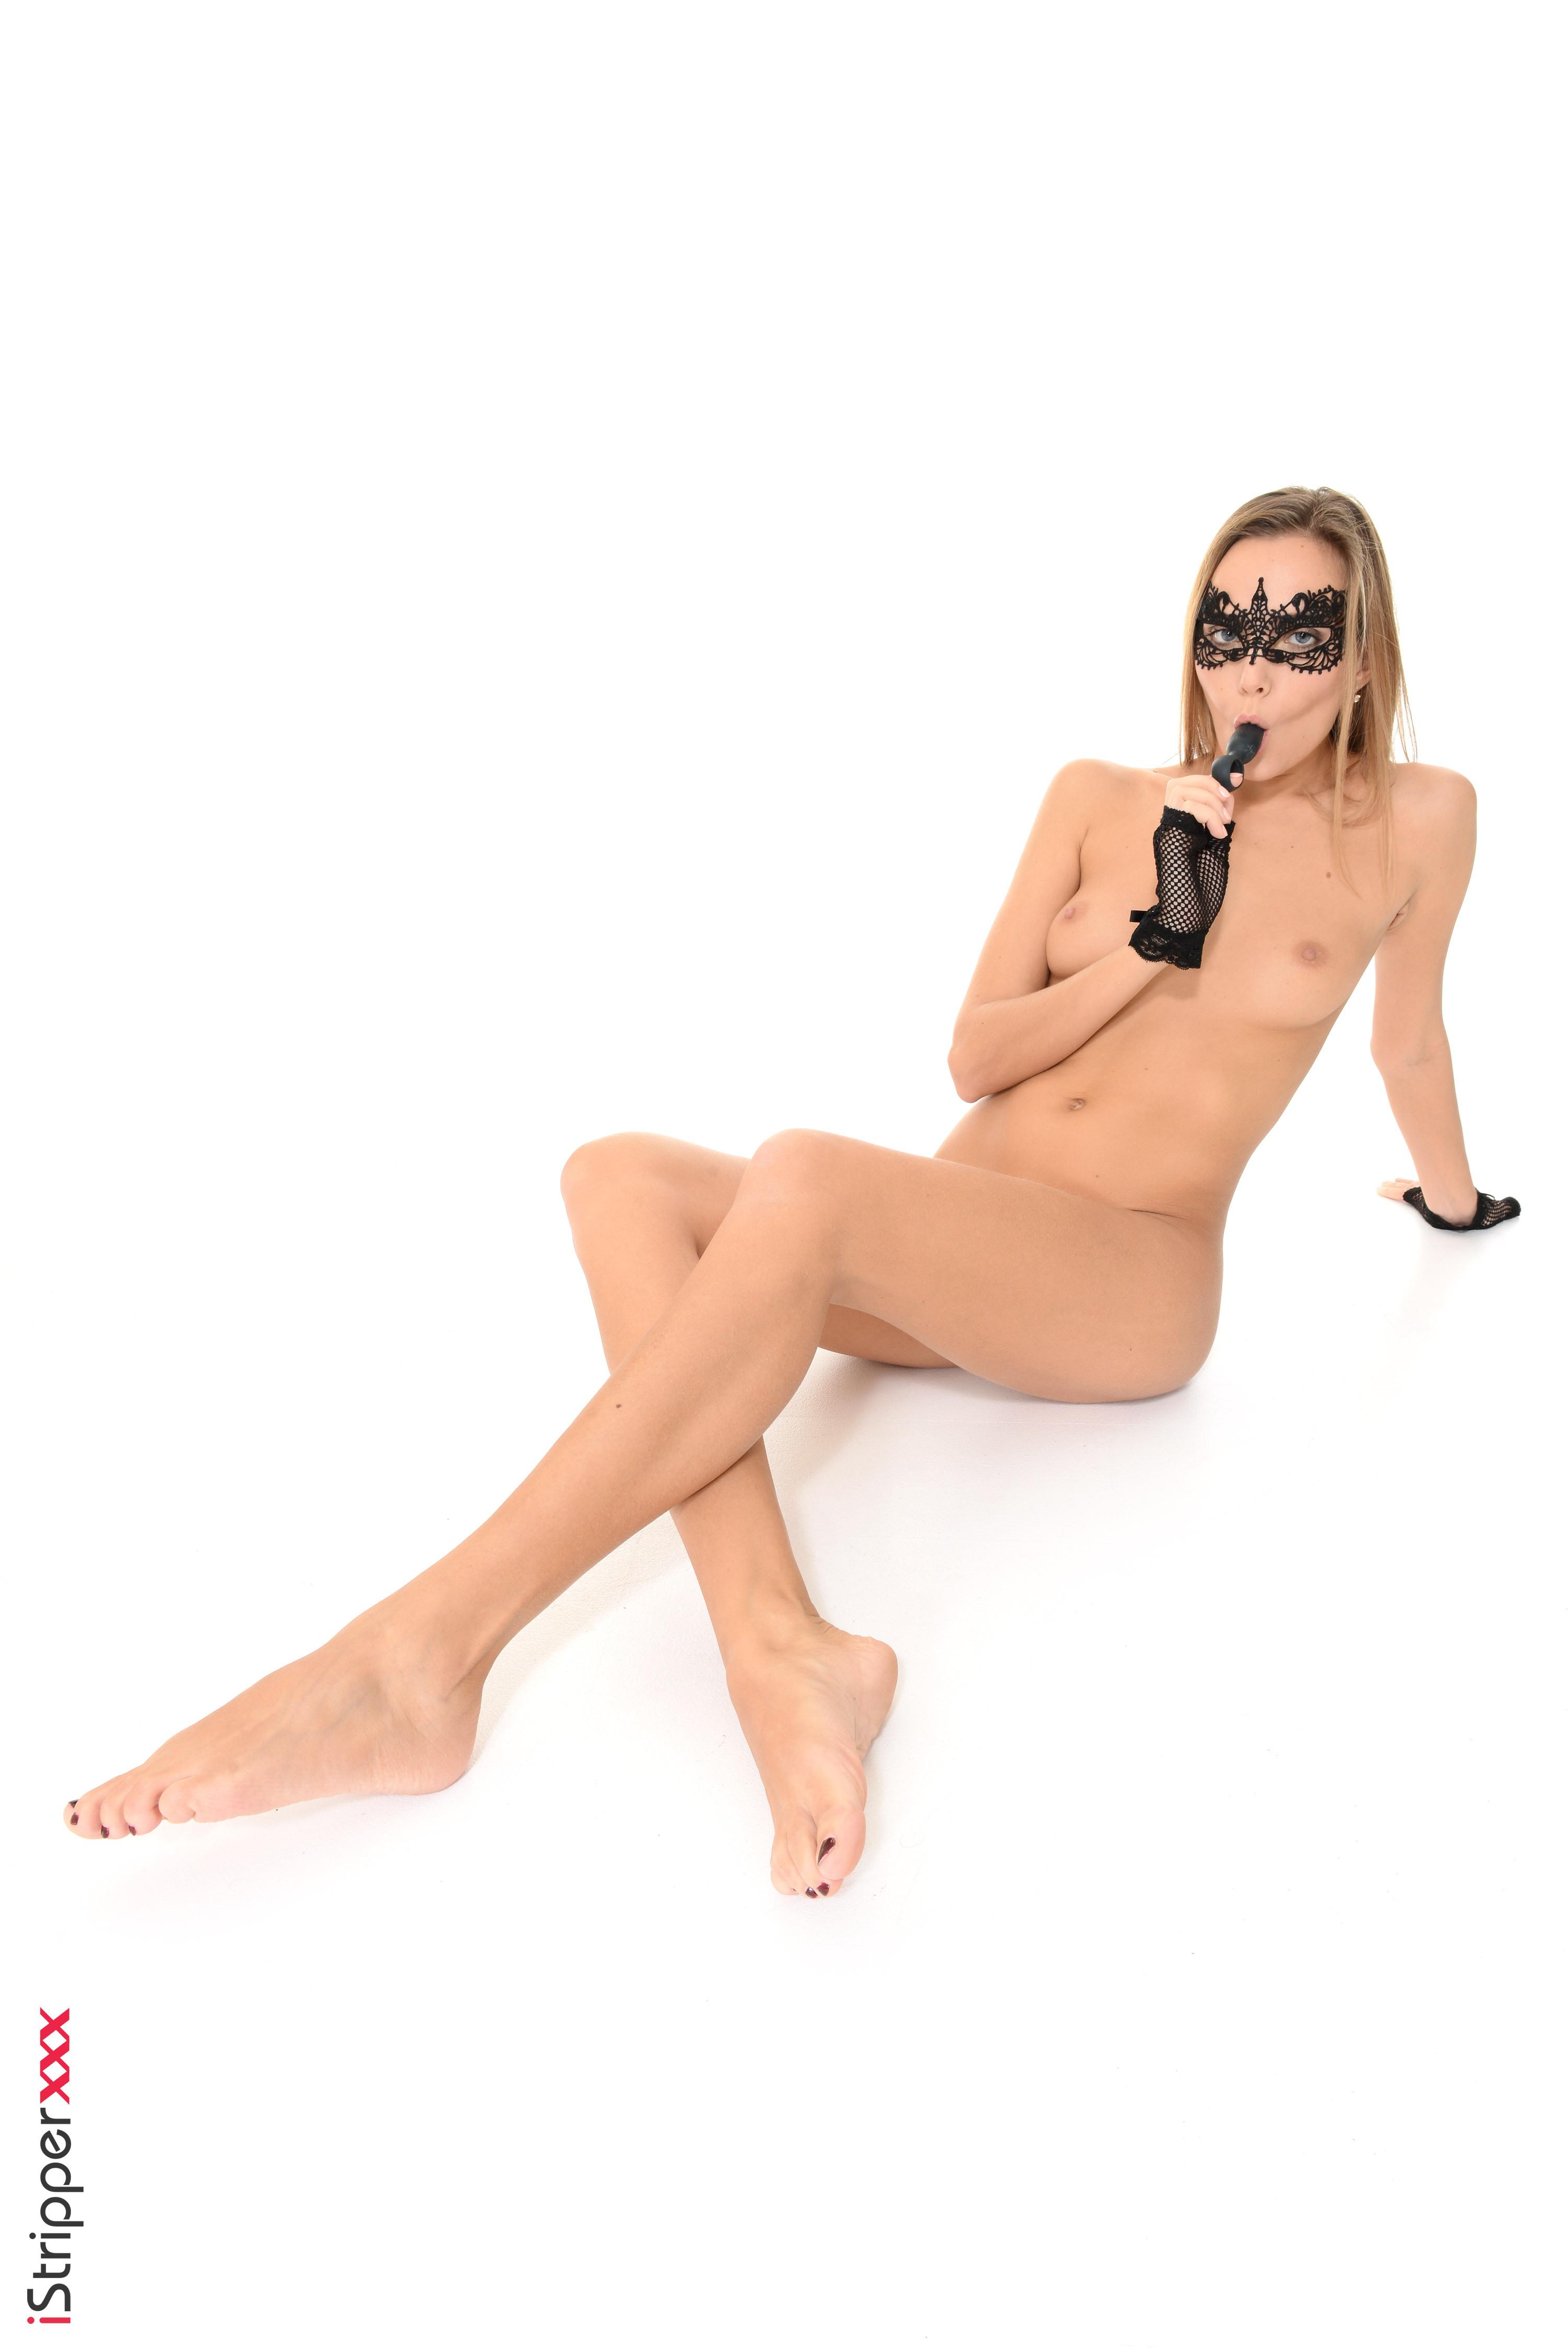 naked girls backgrounds